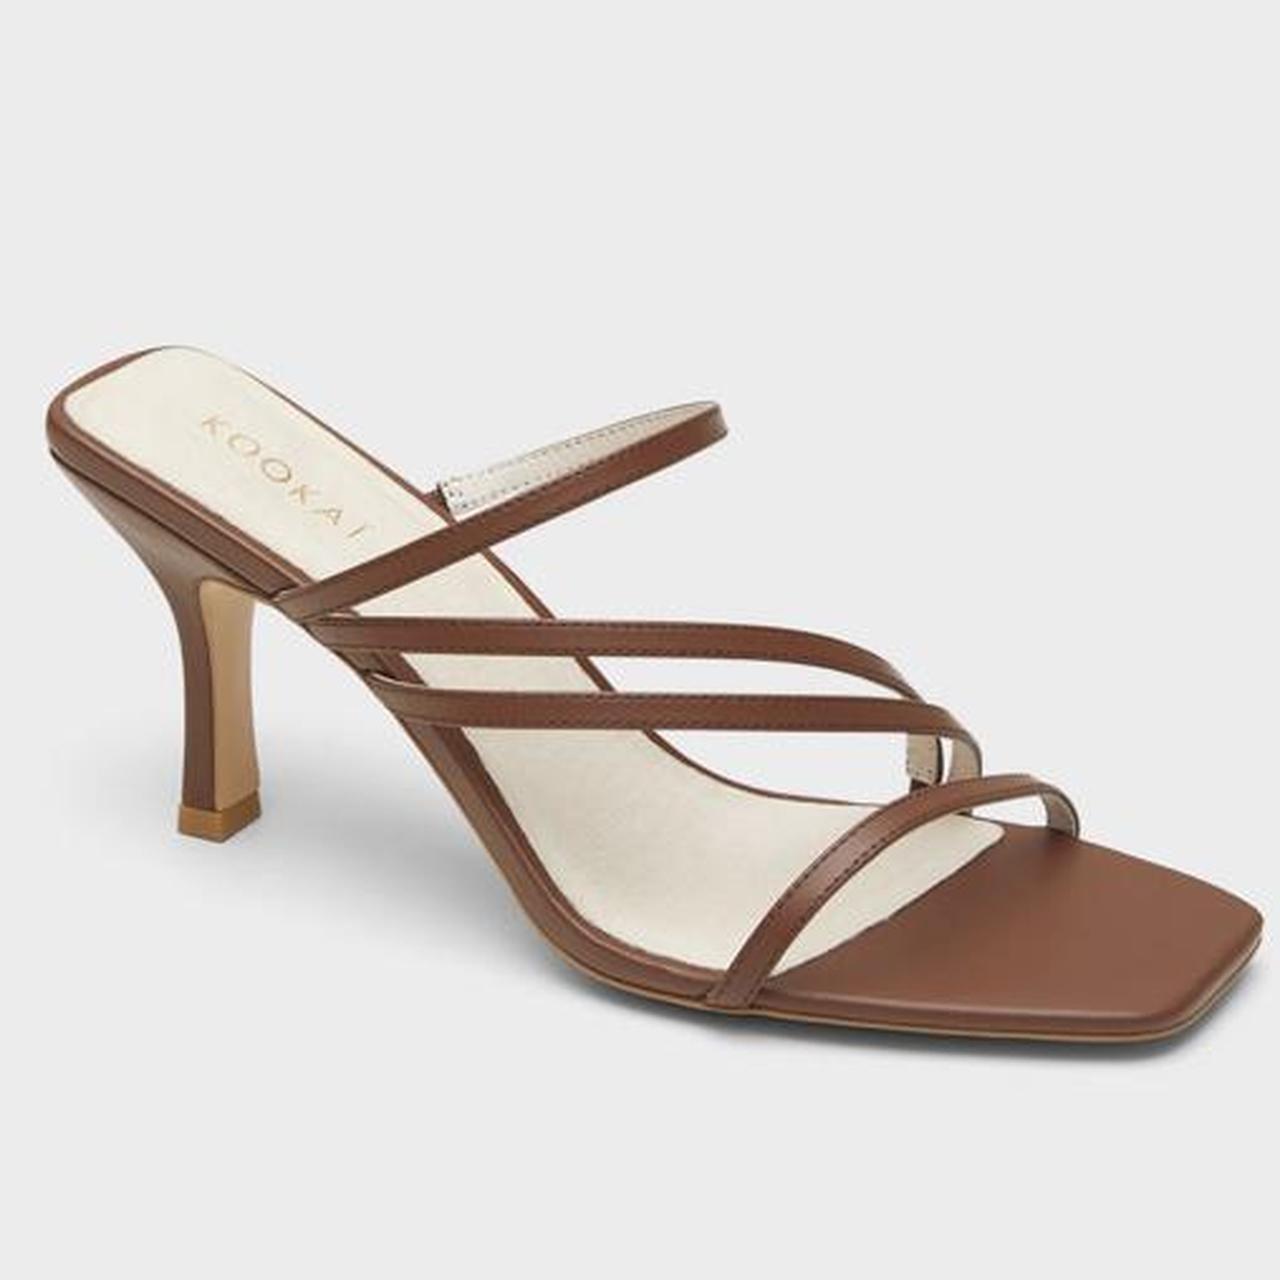 Product Image 1 - Kookaï Erin Heel in Chocolate  Size